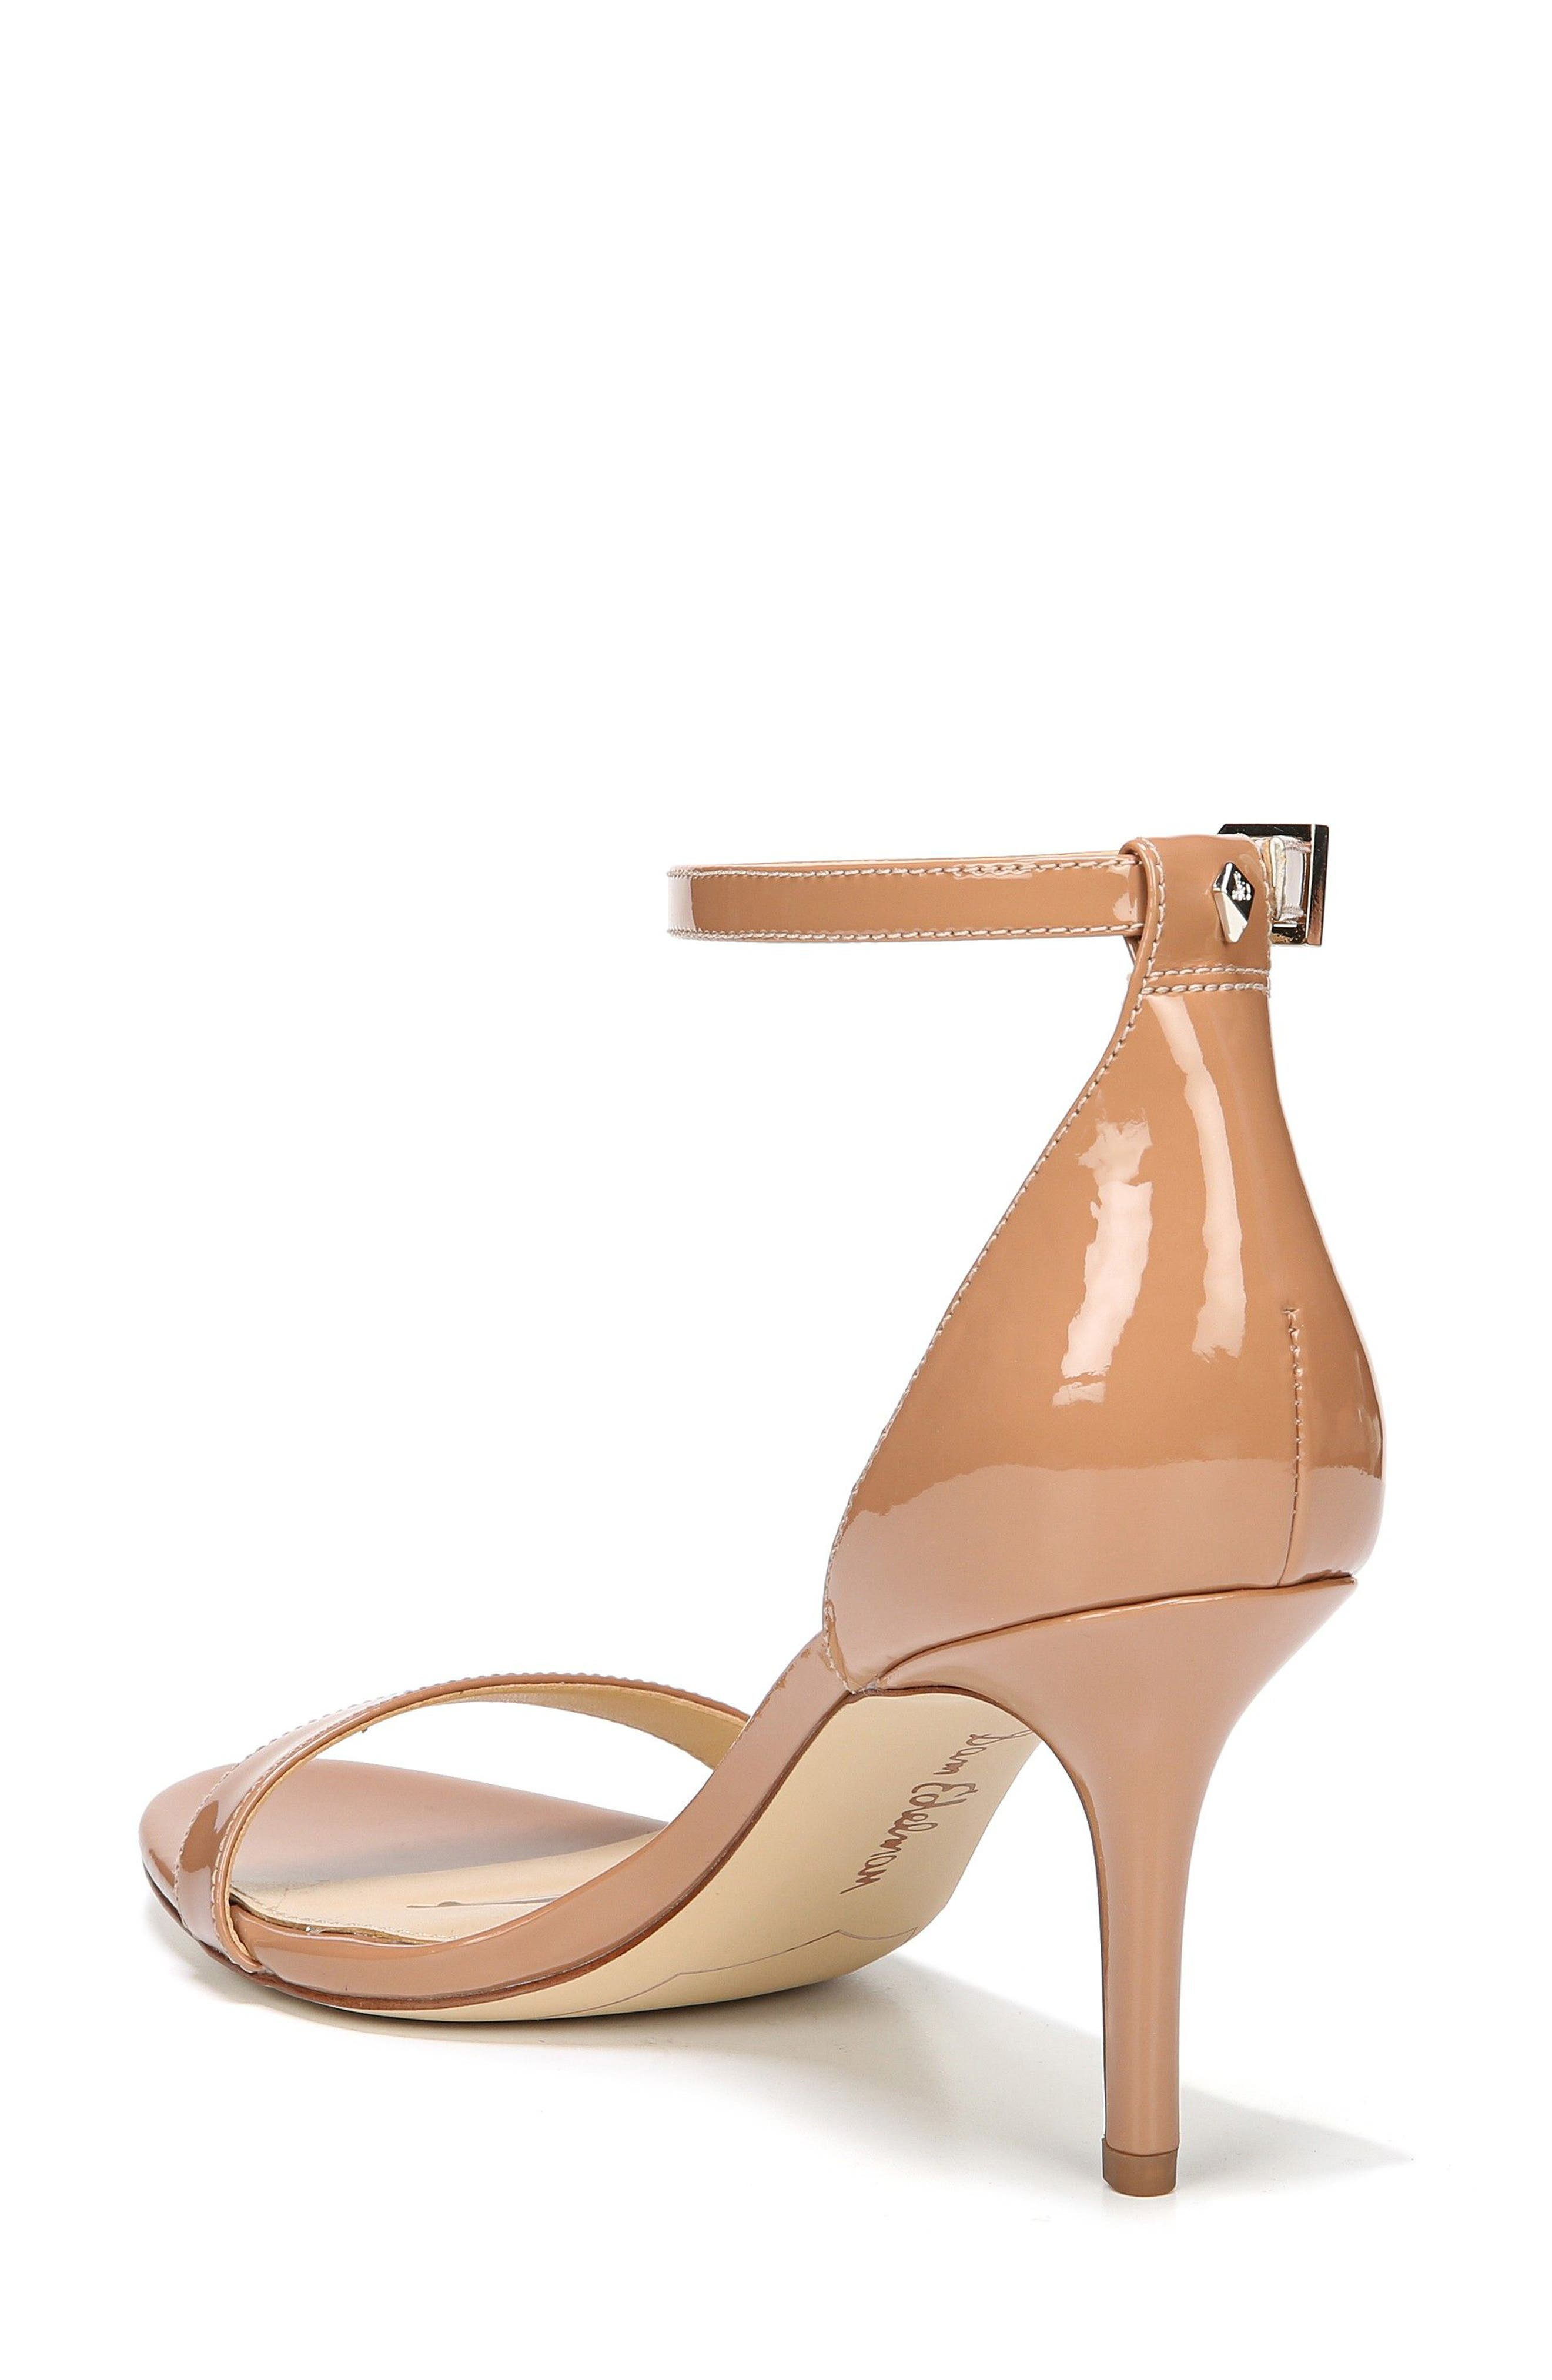 ,                             'Patti' Ankle Strap Sandal,                             Alternate thumbnail 189, color,                             257